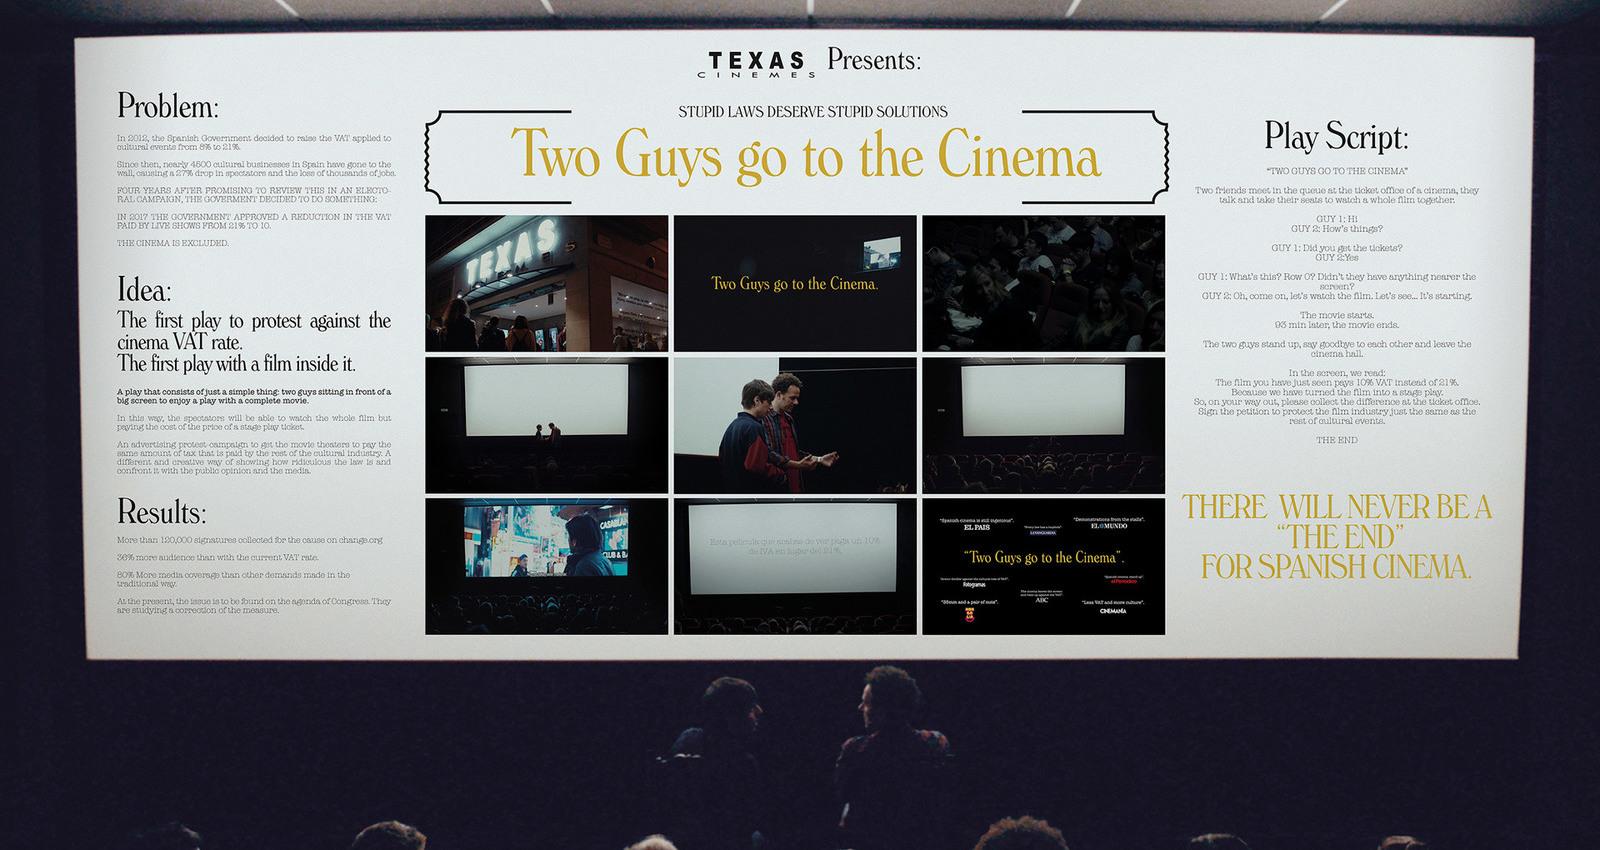 TWO GUYS GO TO CINEMA